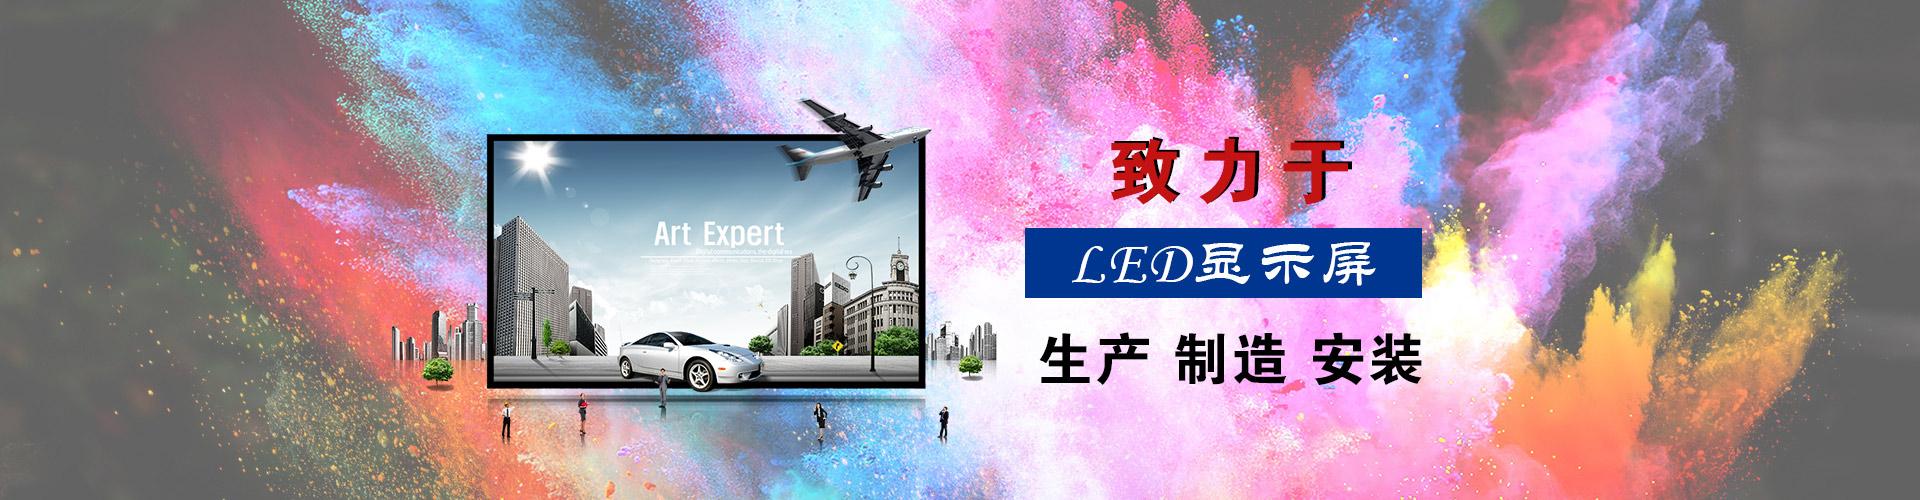 武汉LED大屏幕